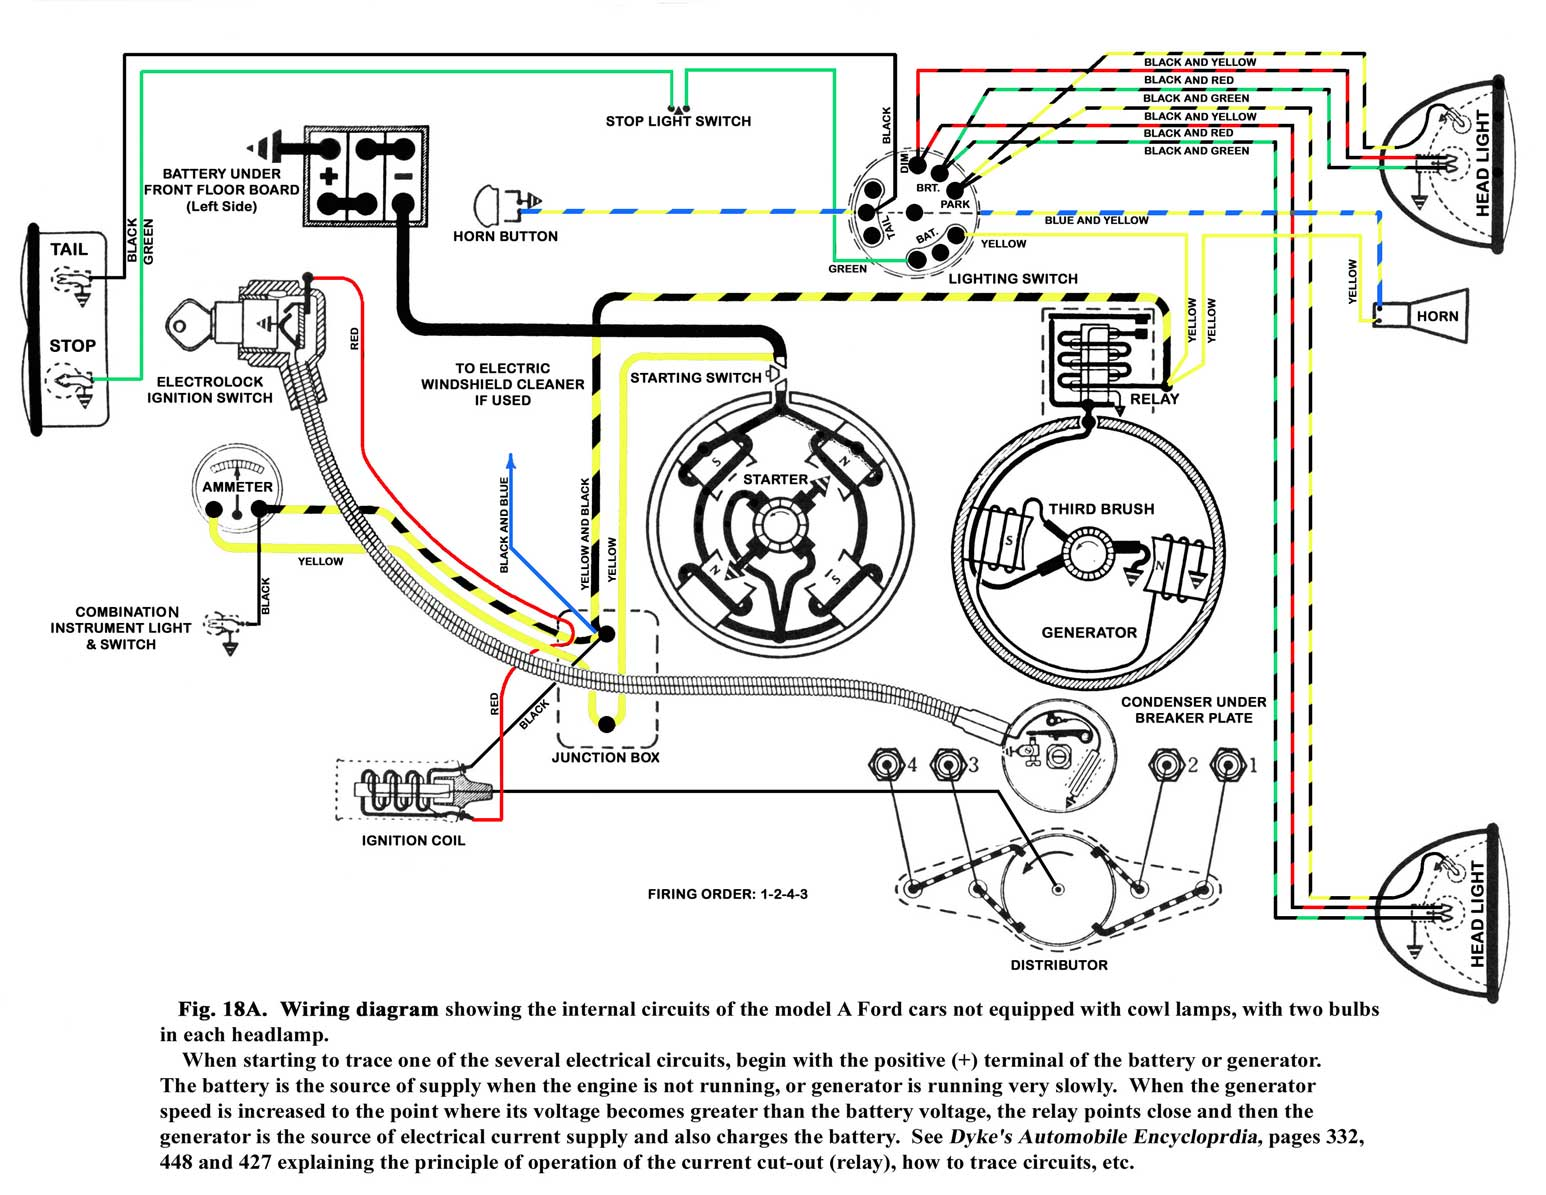 Ford Flathead Wiring Diagram Master Blogs 1936 Distributor Simple Diagrams Rh 38 Studio011 De Engine